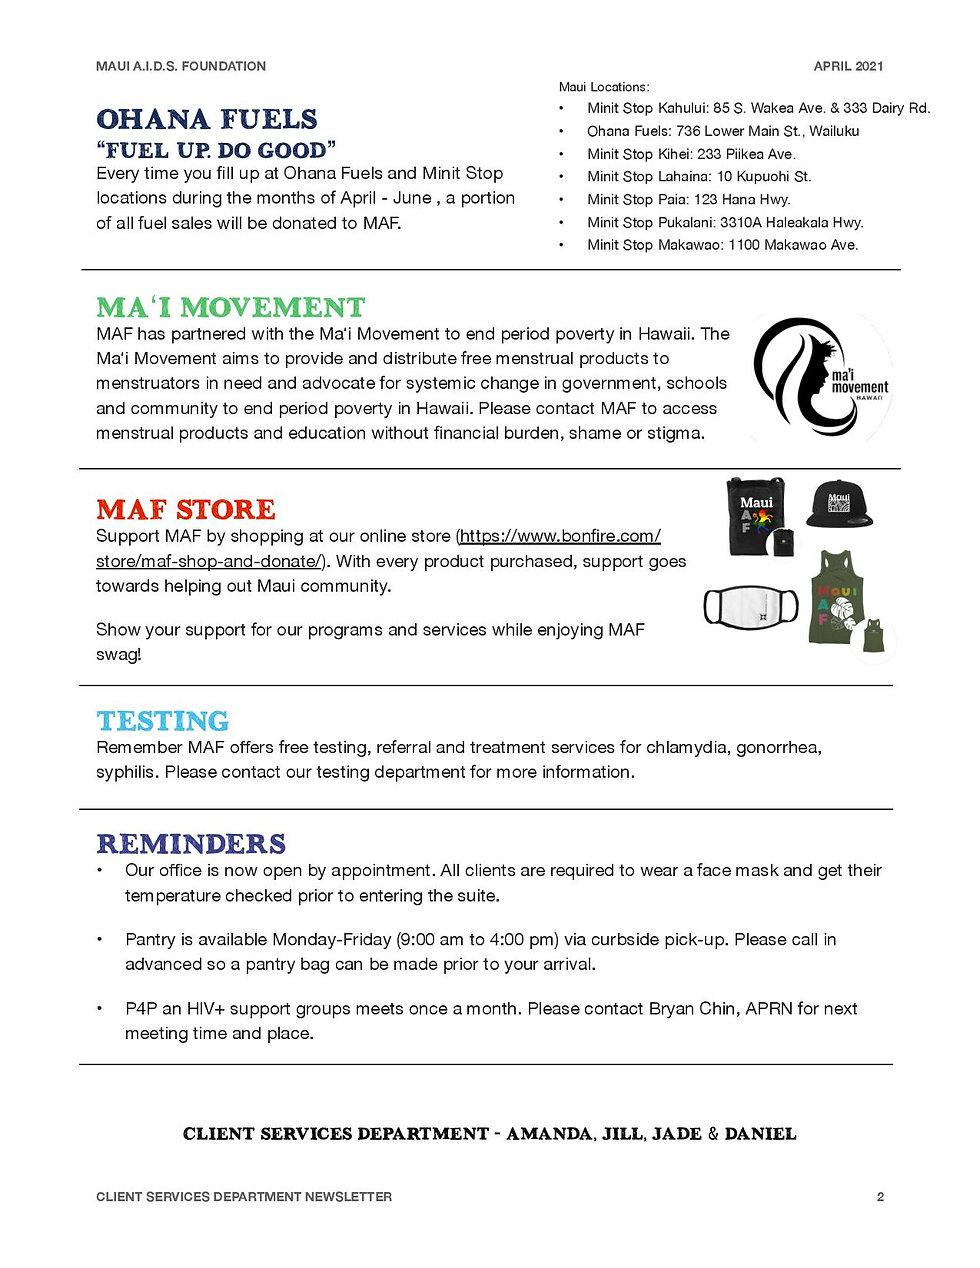 Client Newsletter April 21 (1)-page-002.